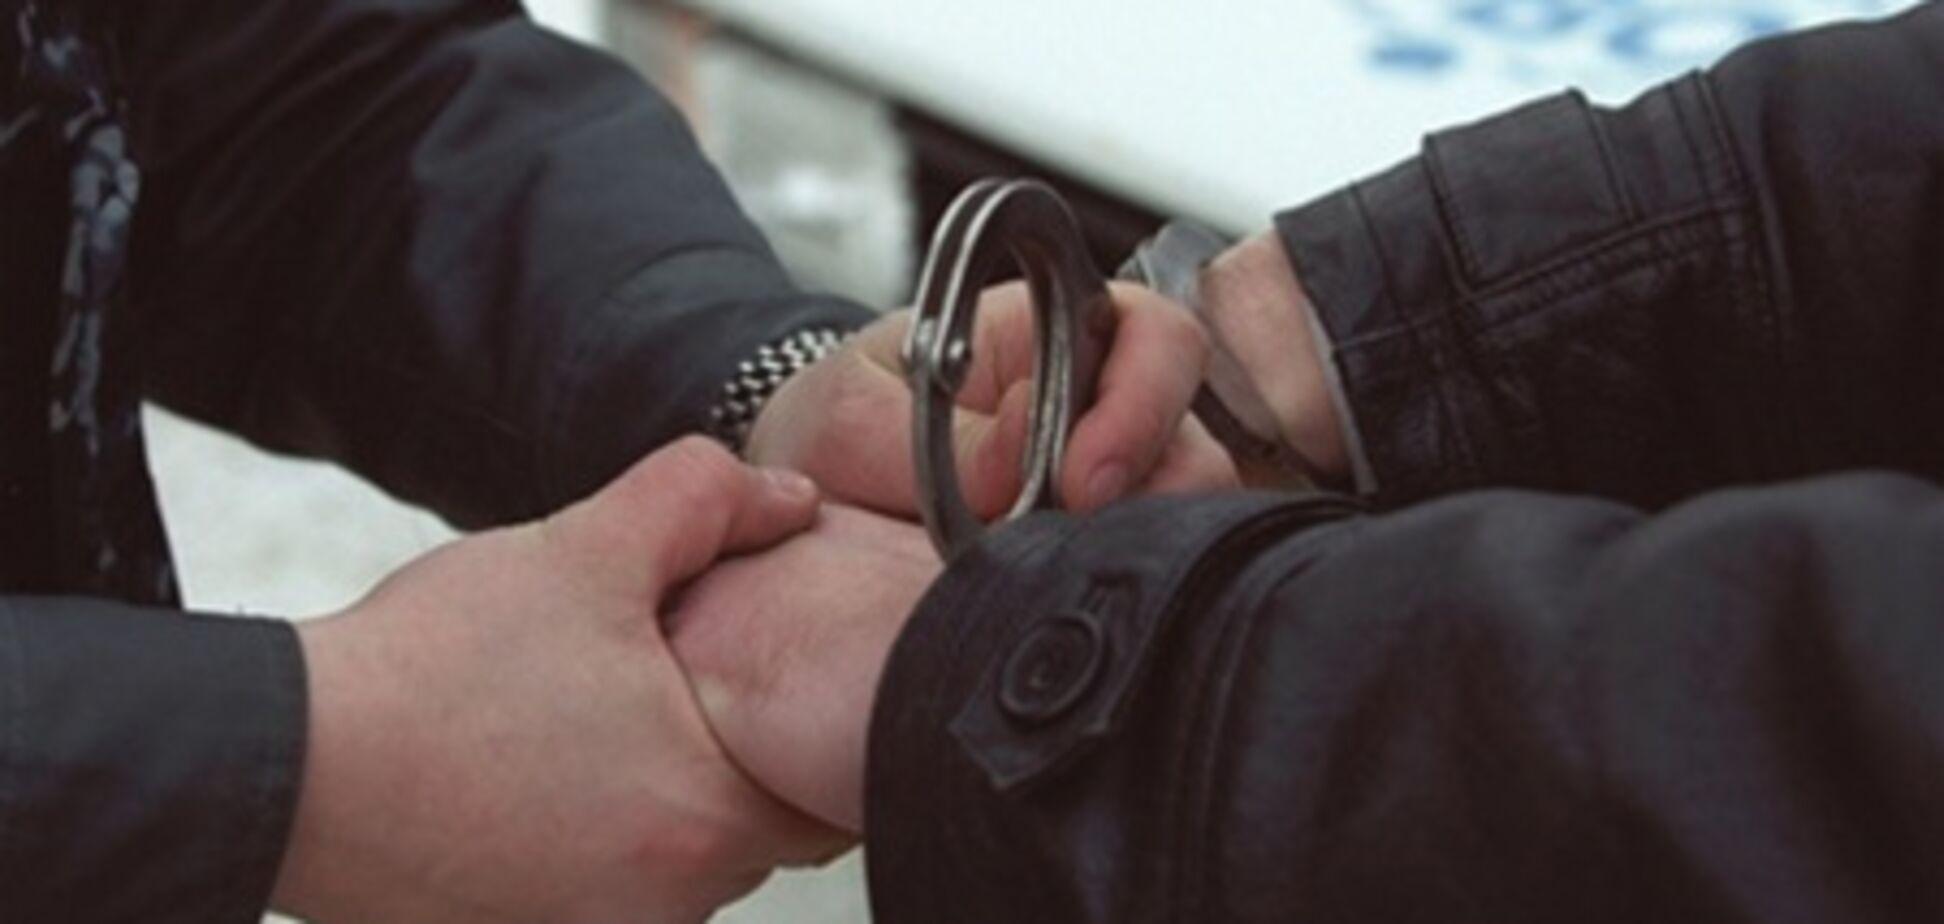 На взятке попался глава горсовета на Луганщине